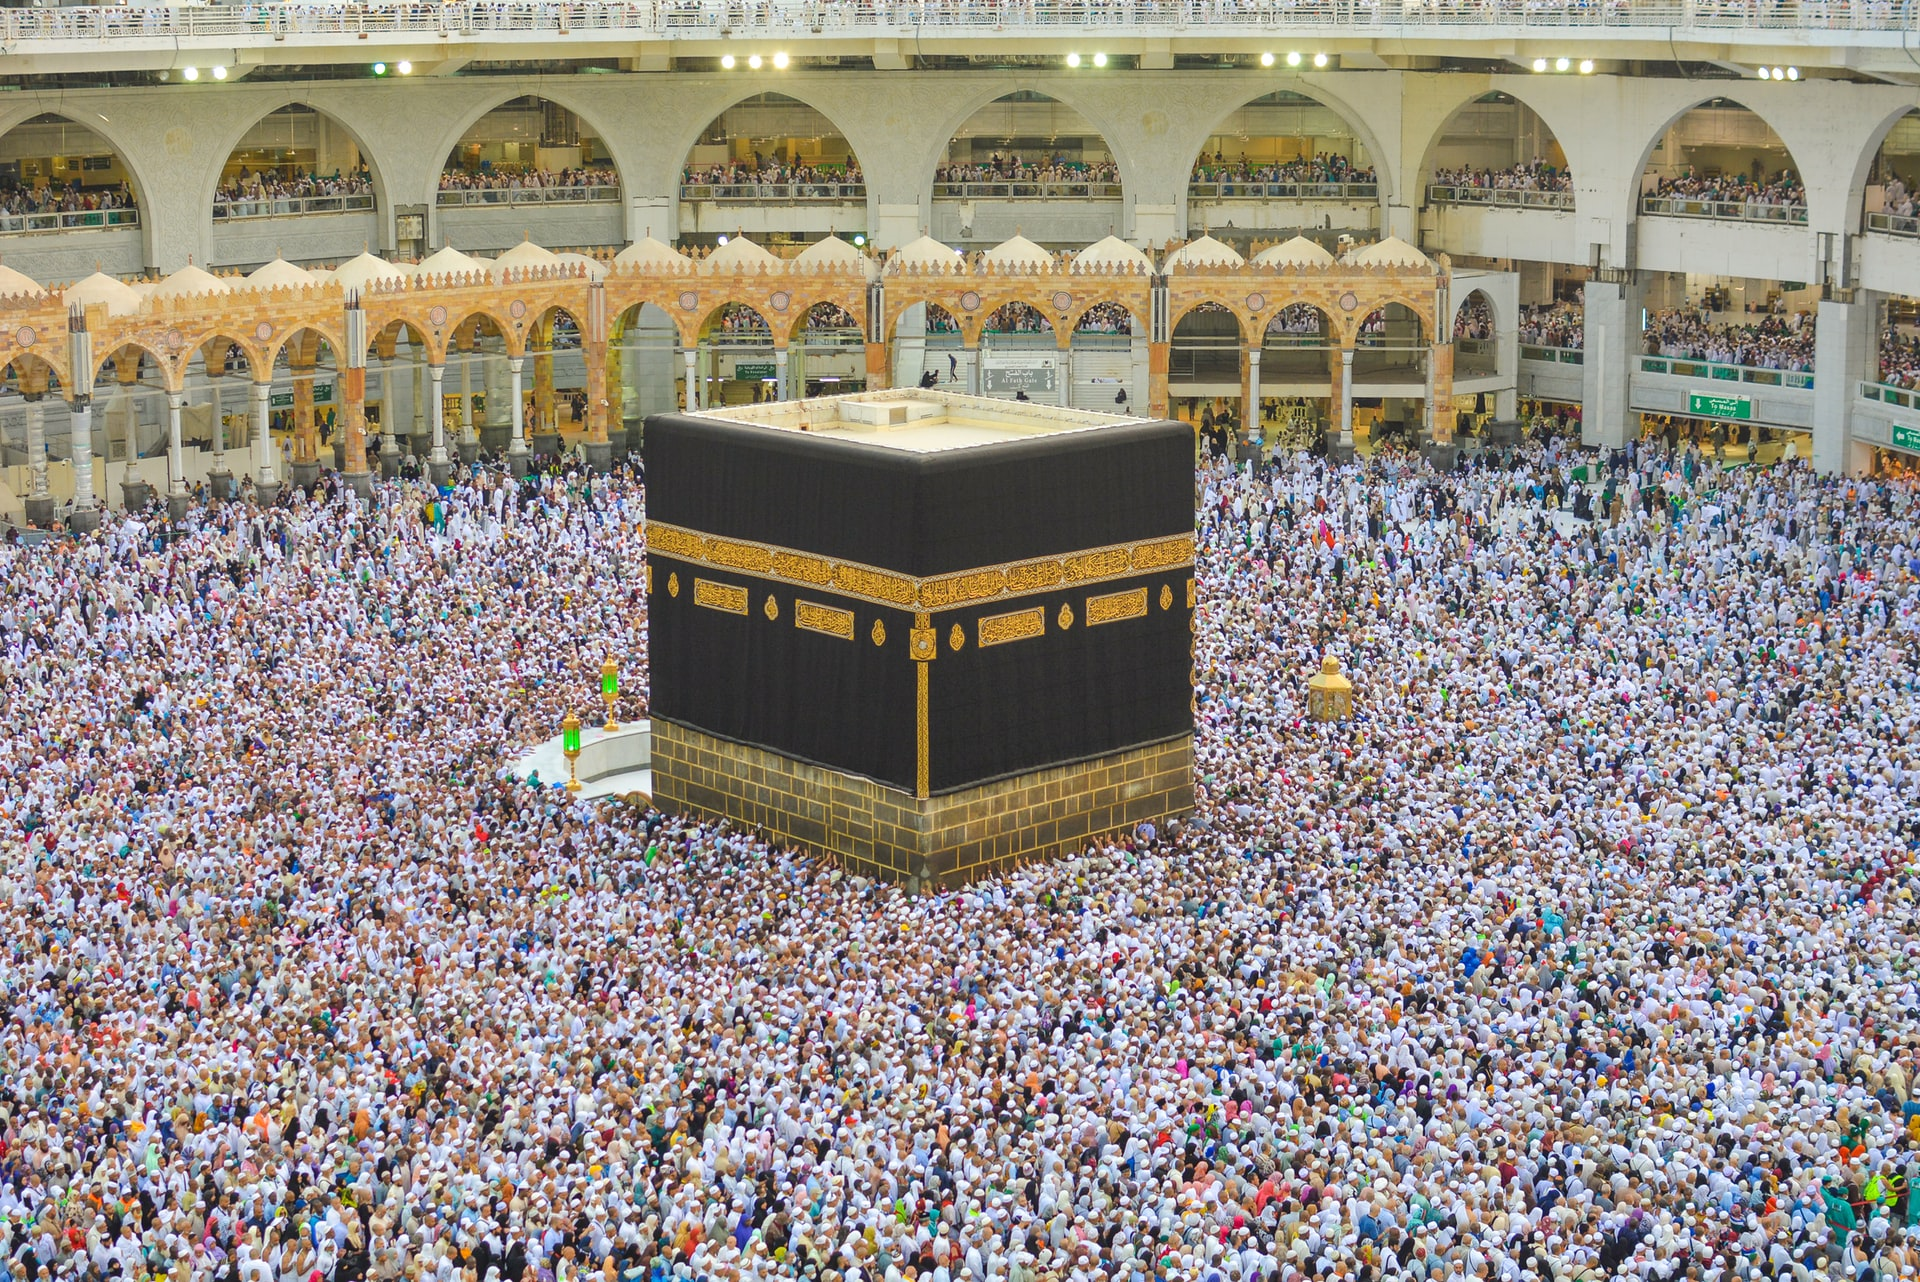 Millions of Muslims seek God in Saudi Arabia during Ramadan